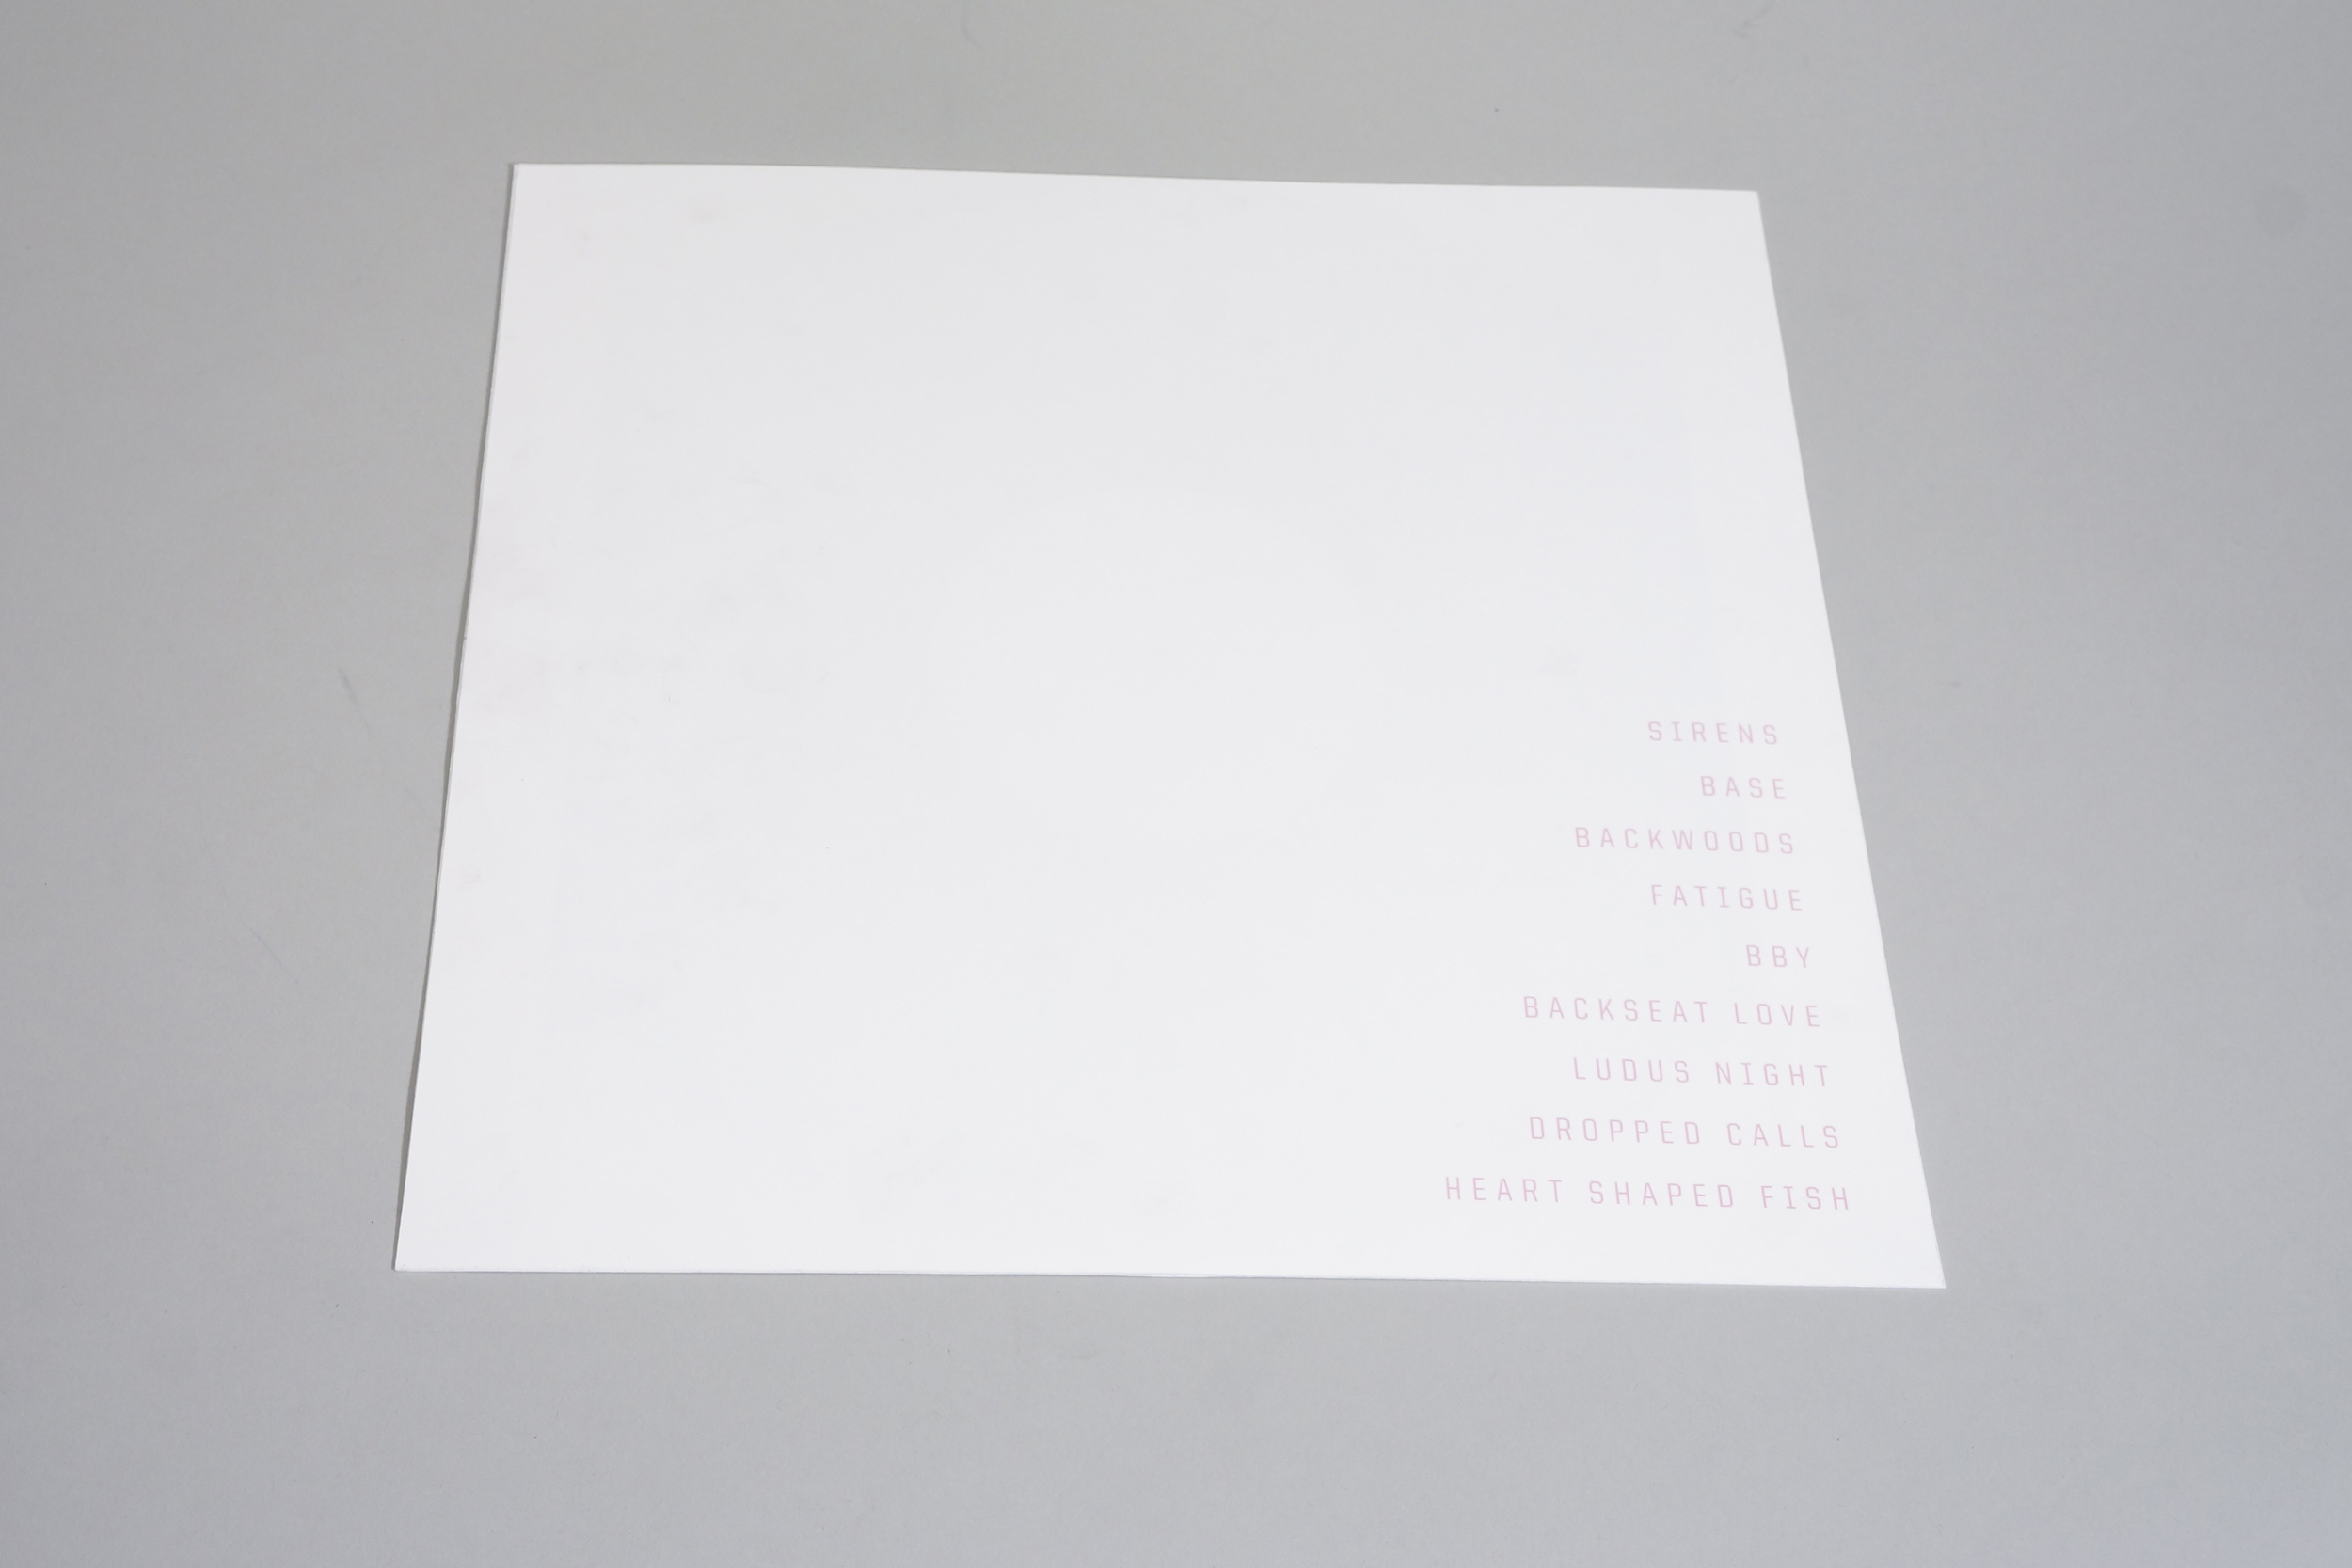 DSC03744 (1).jpg